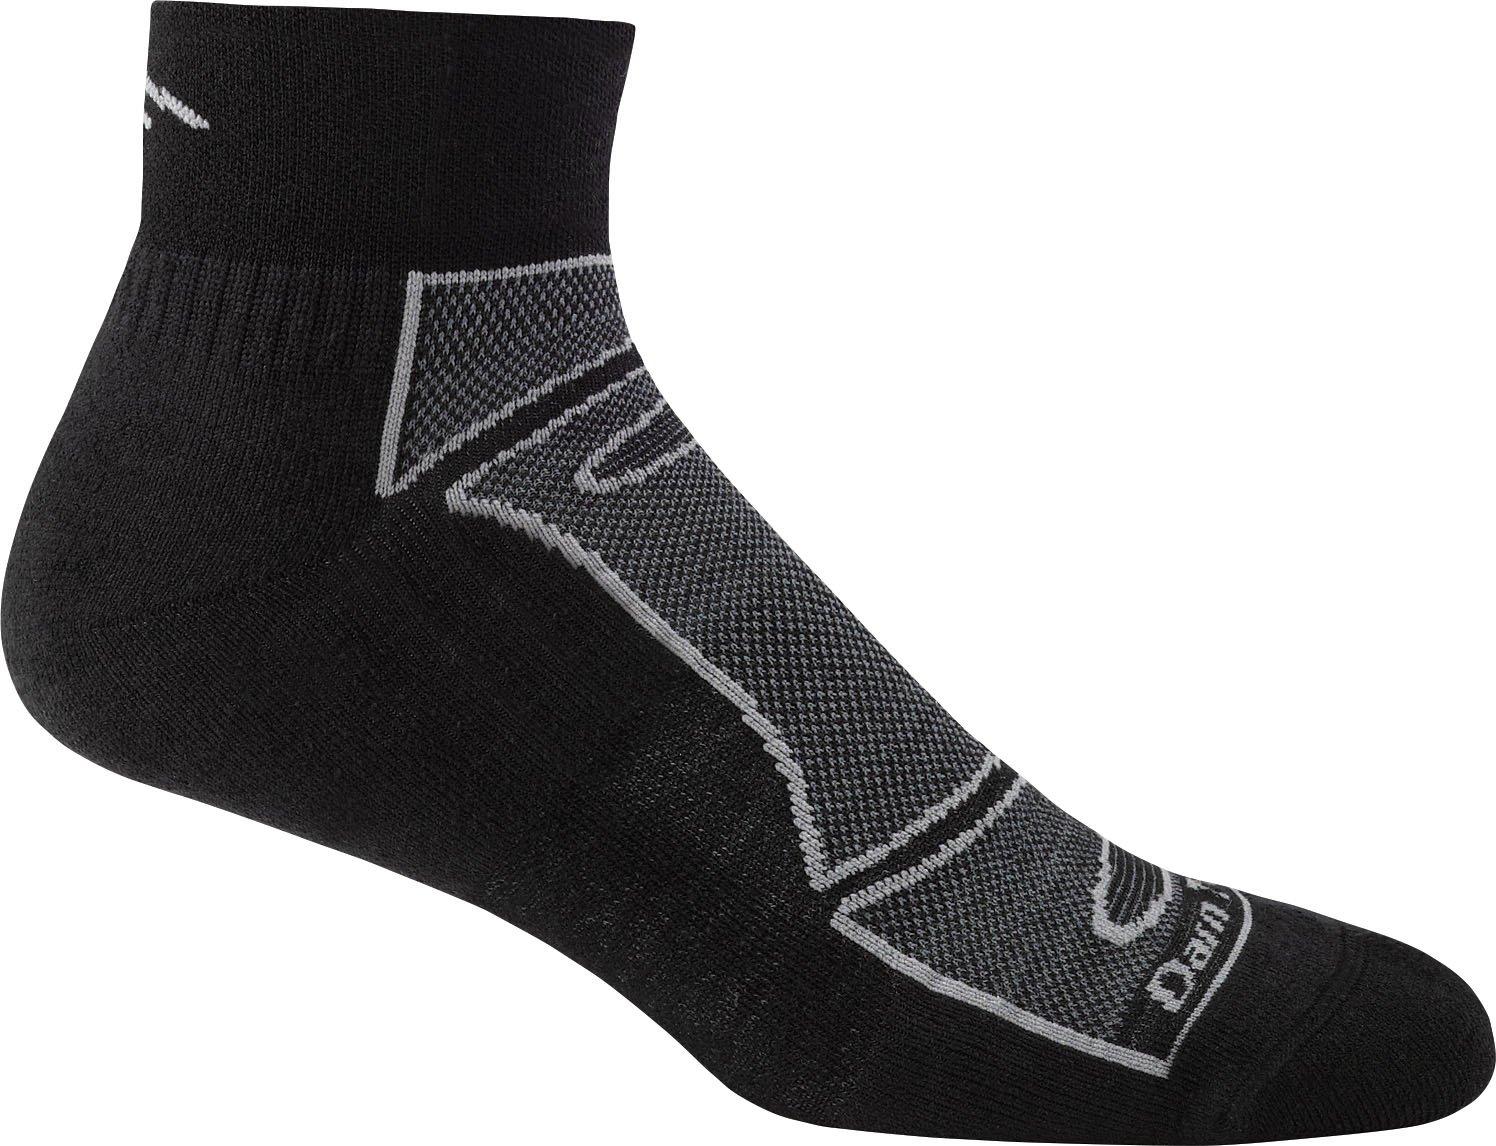 Darn Tough Men's Merino Wool 1/4 Sock Light Cushion - 6 Pack Special Offer, Black/Gray, Large